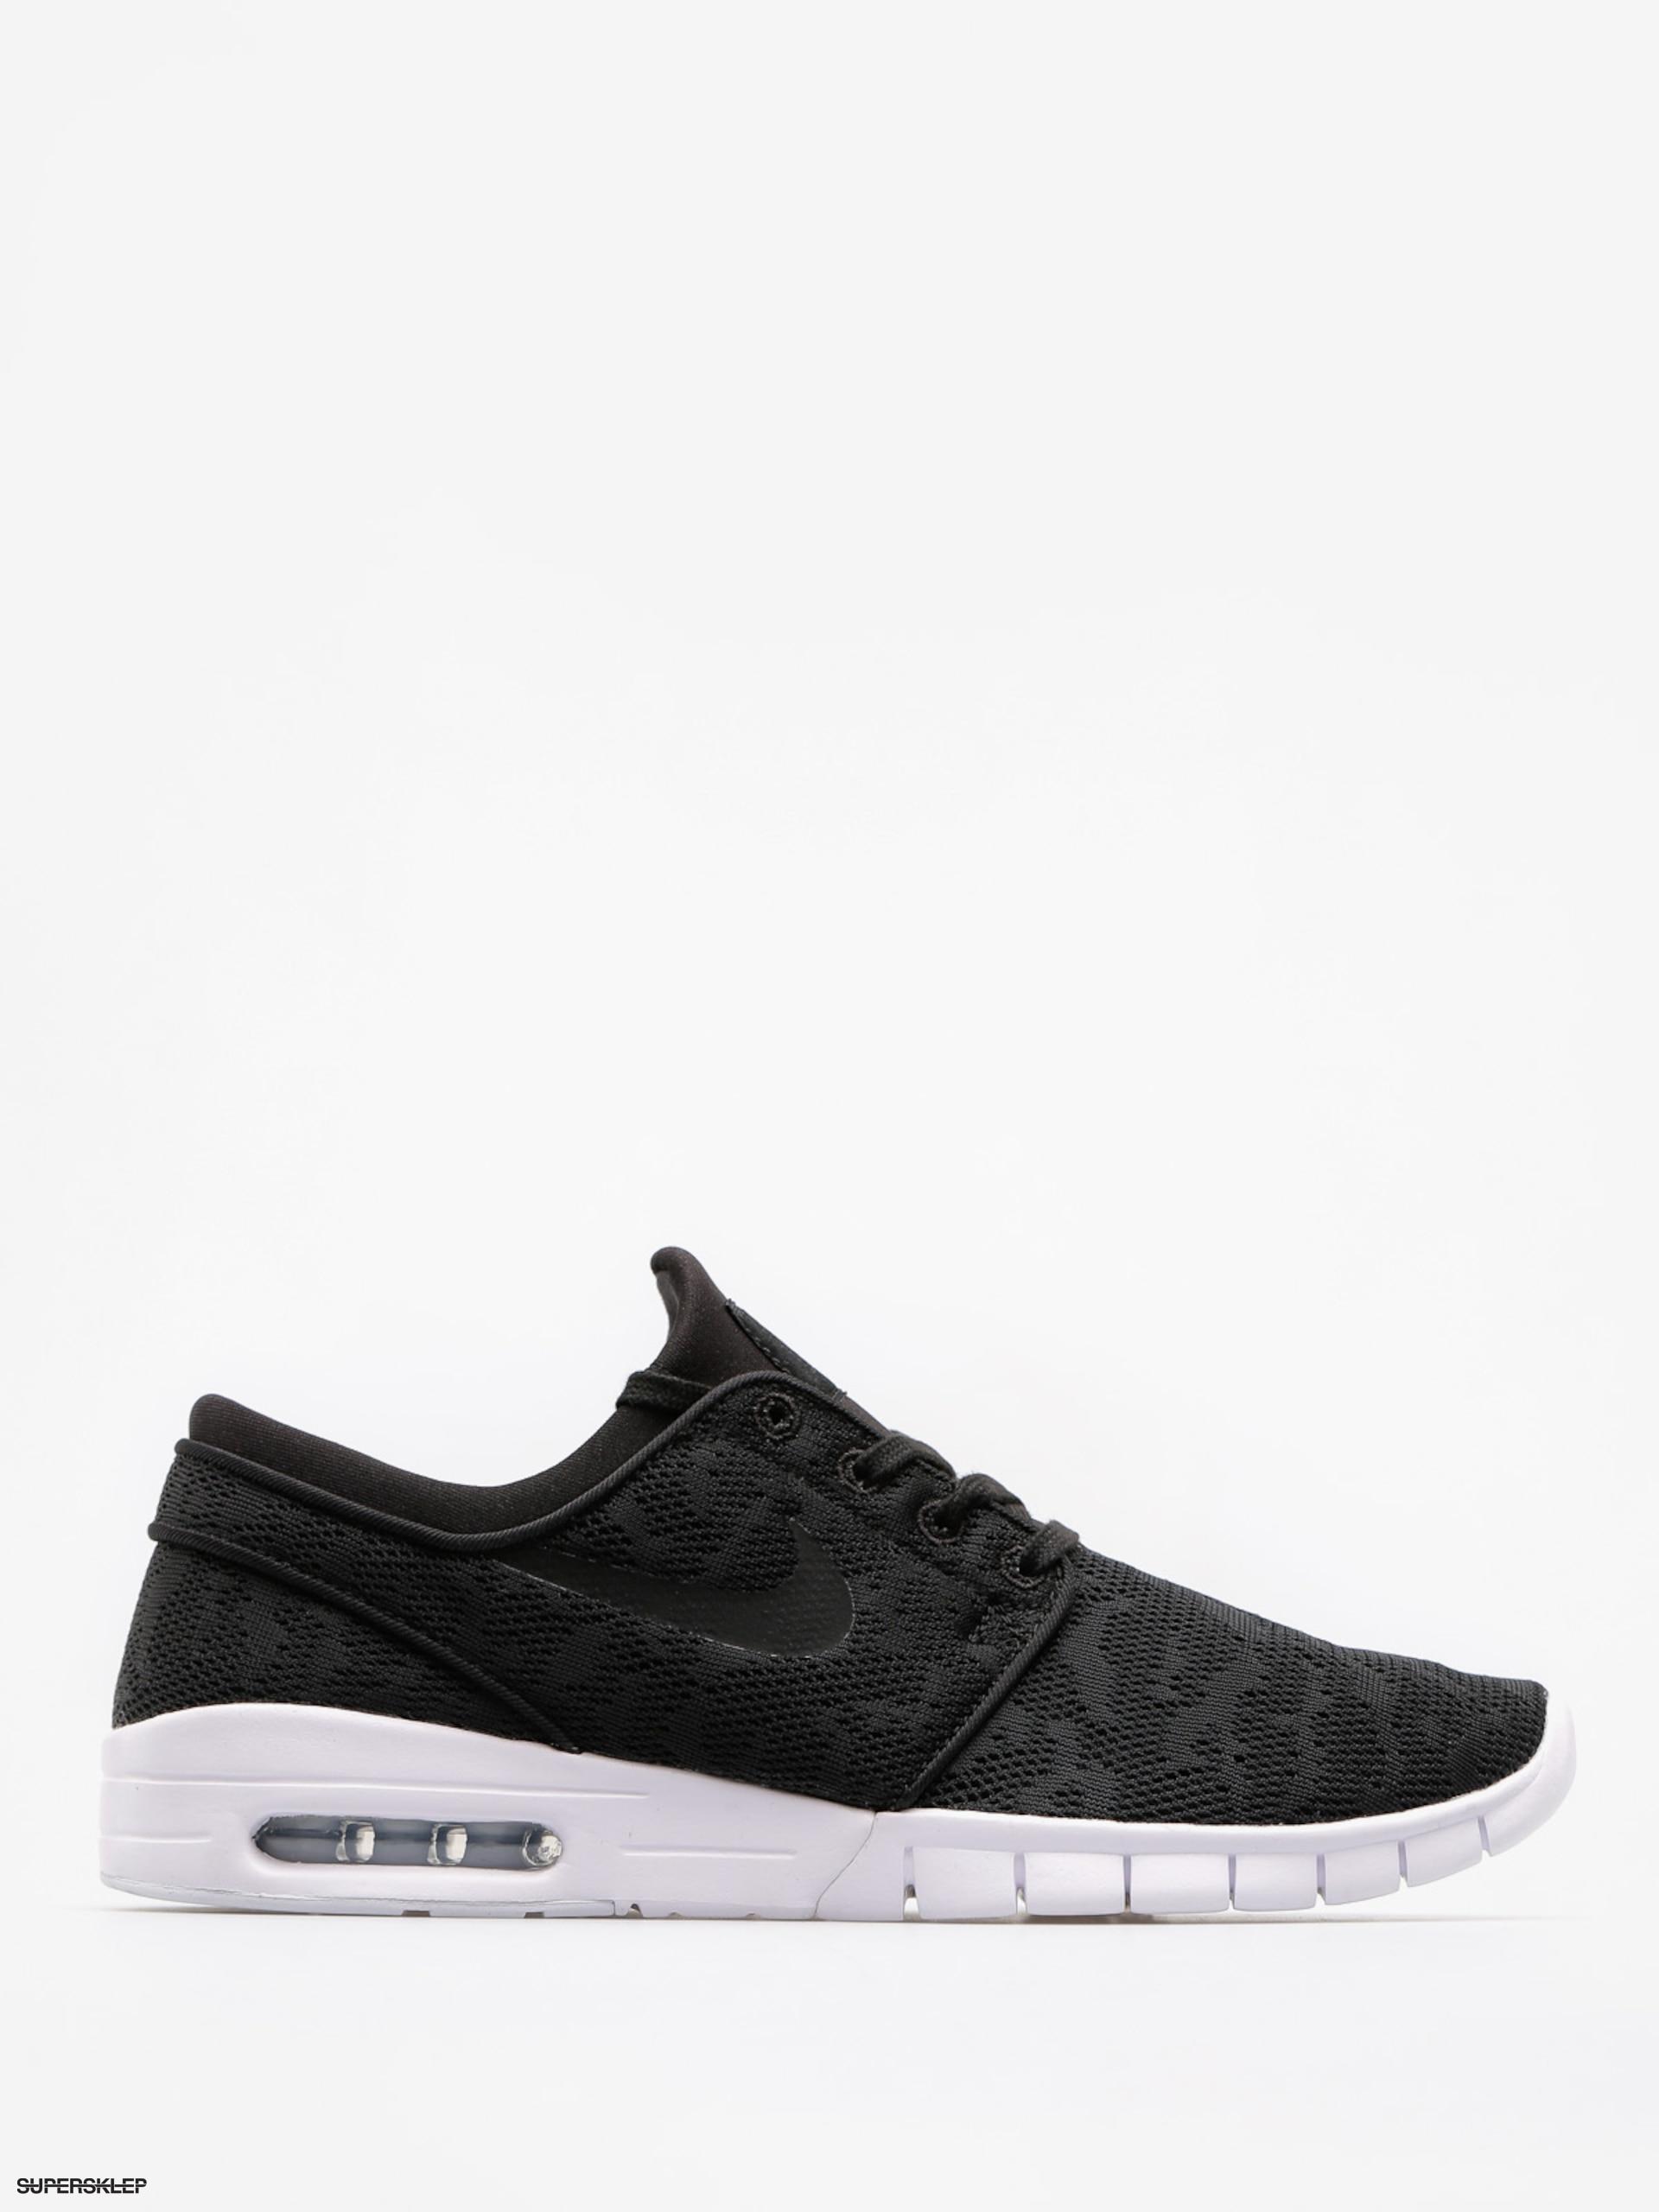 bc96e155cb Buty Nike SB Stefan Janoski Max (black/black white)